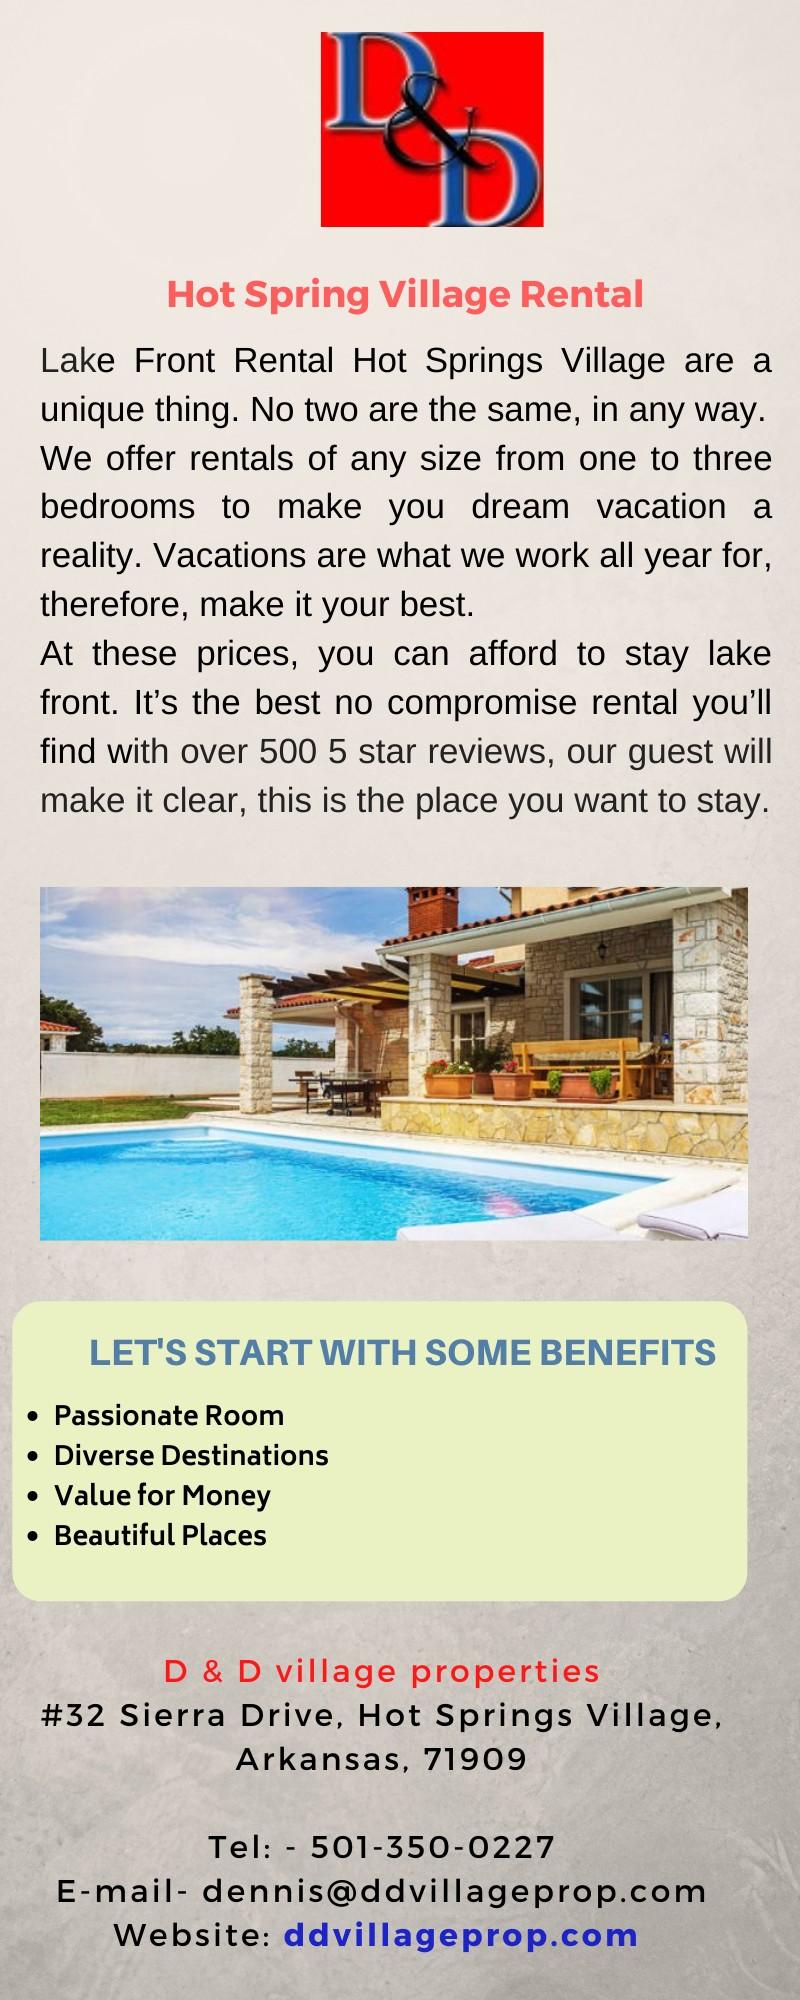 Hot Spring Village on a rental home